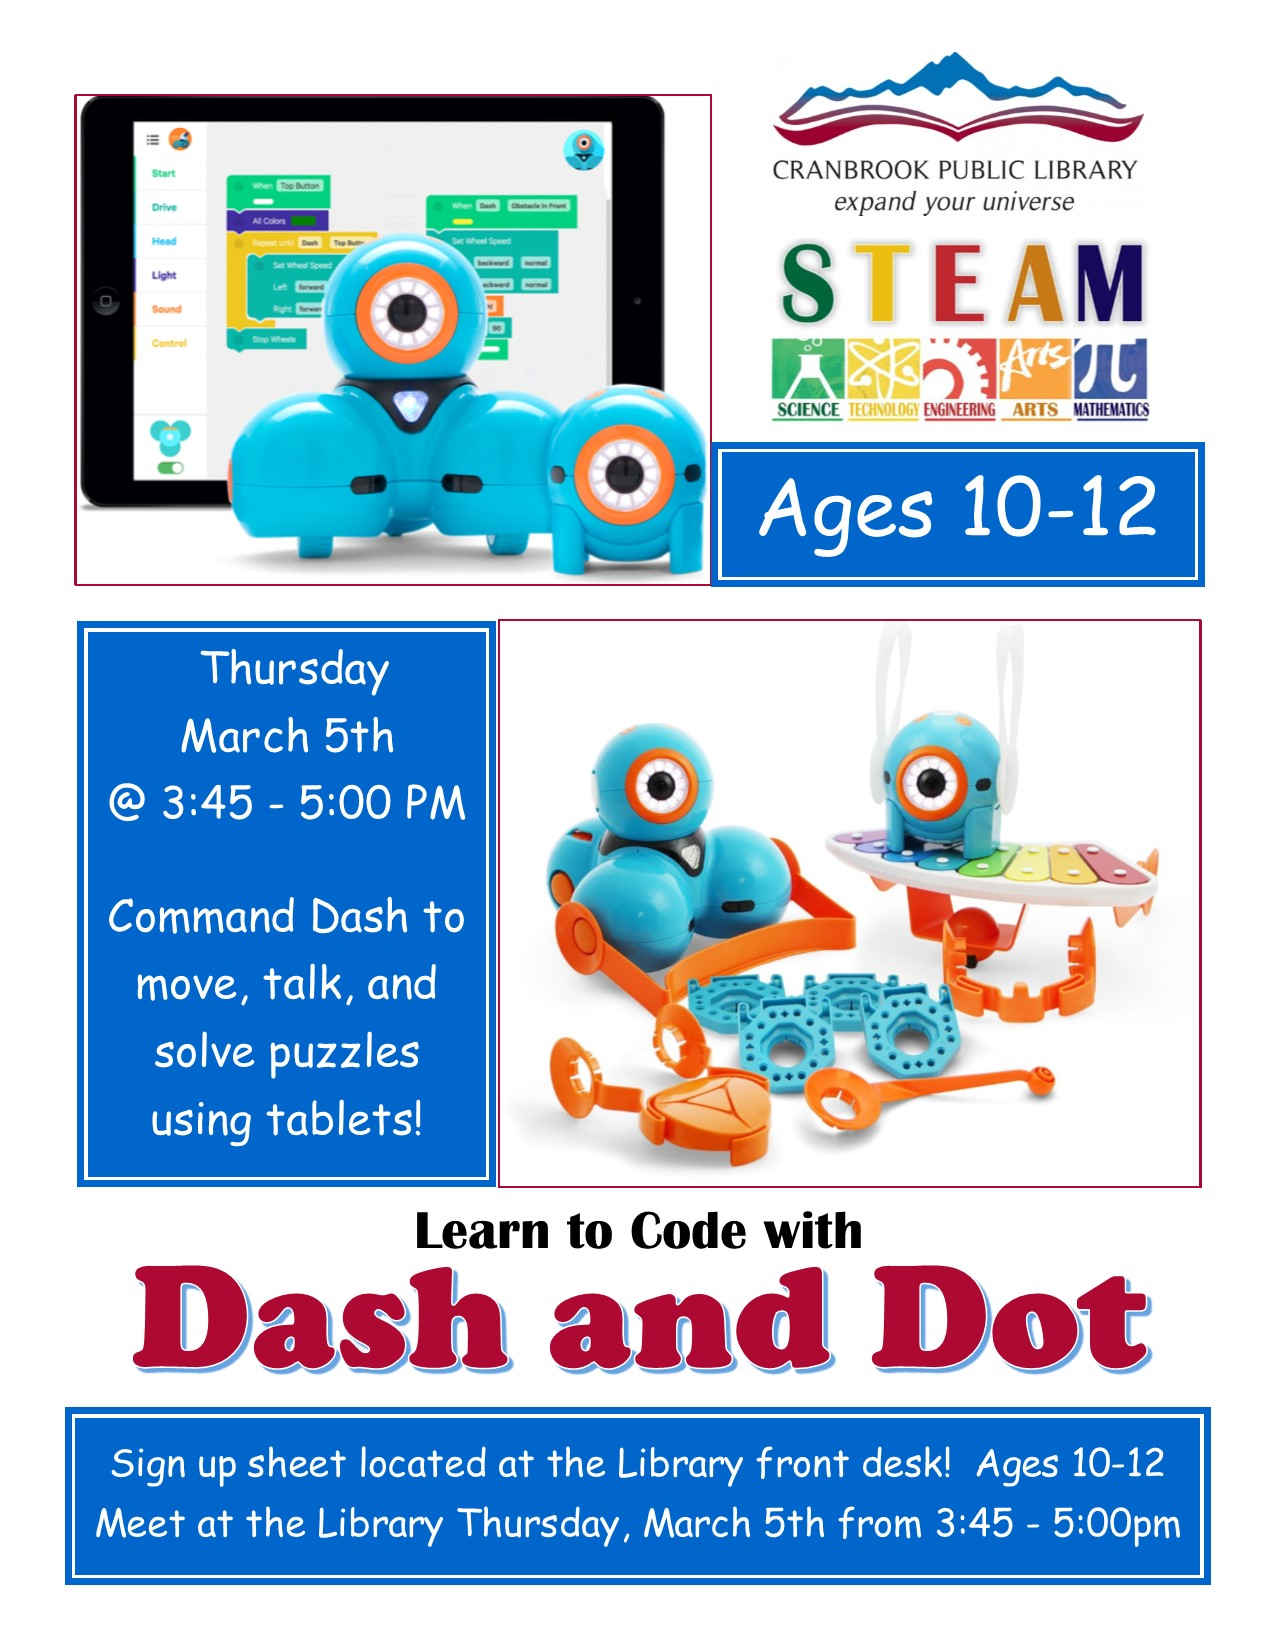 Dash And Dot @ Cranbrook Public Library